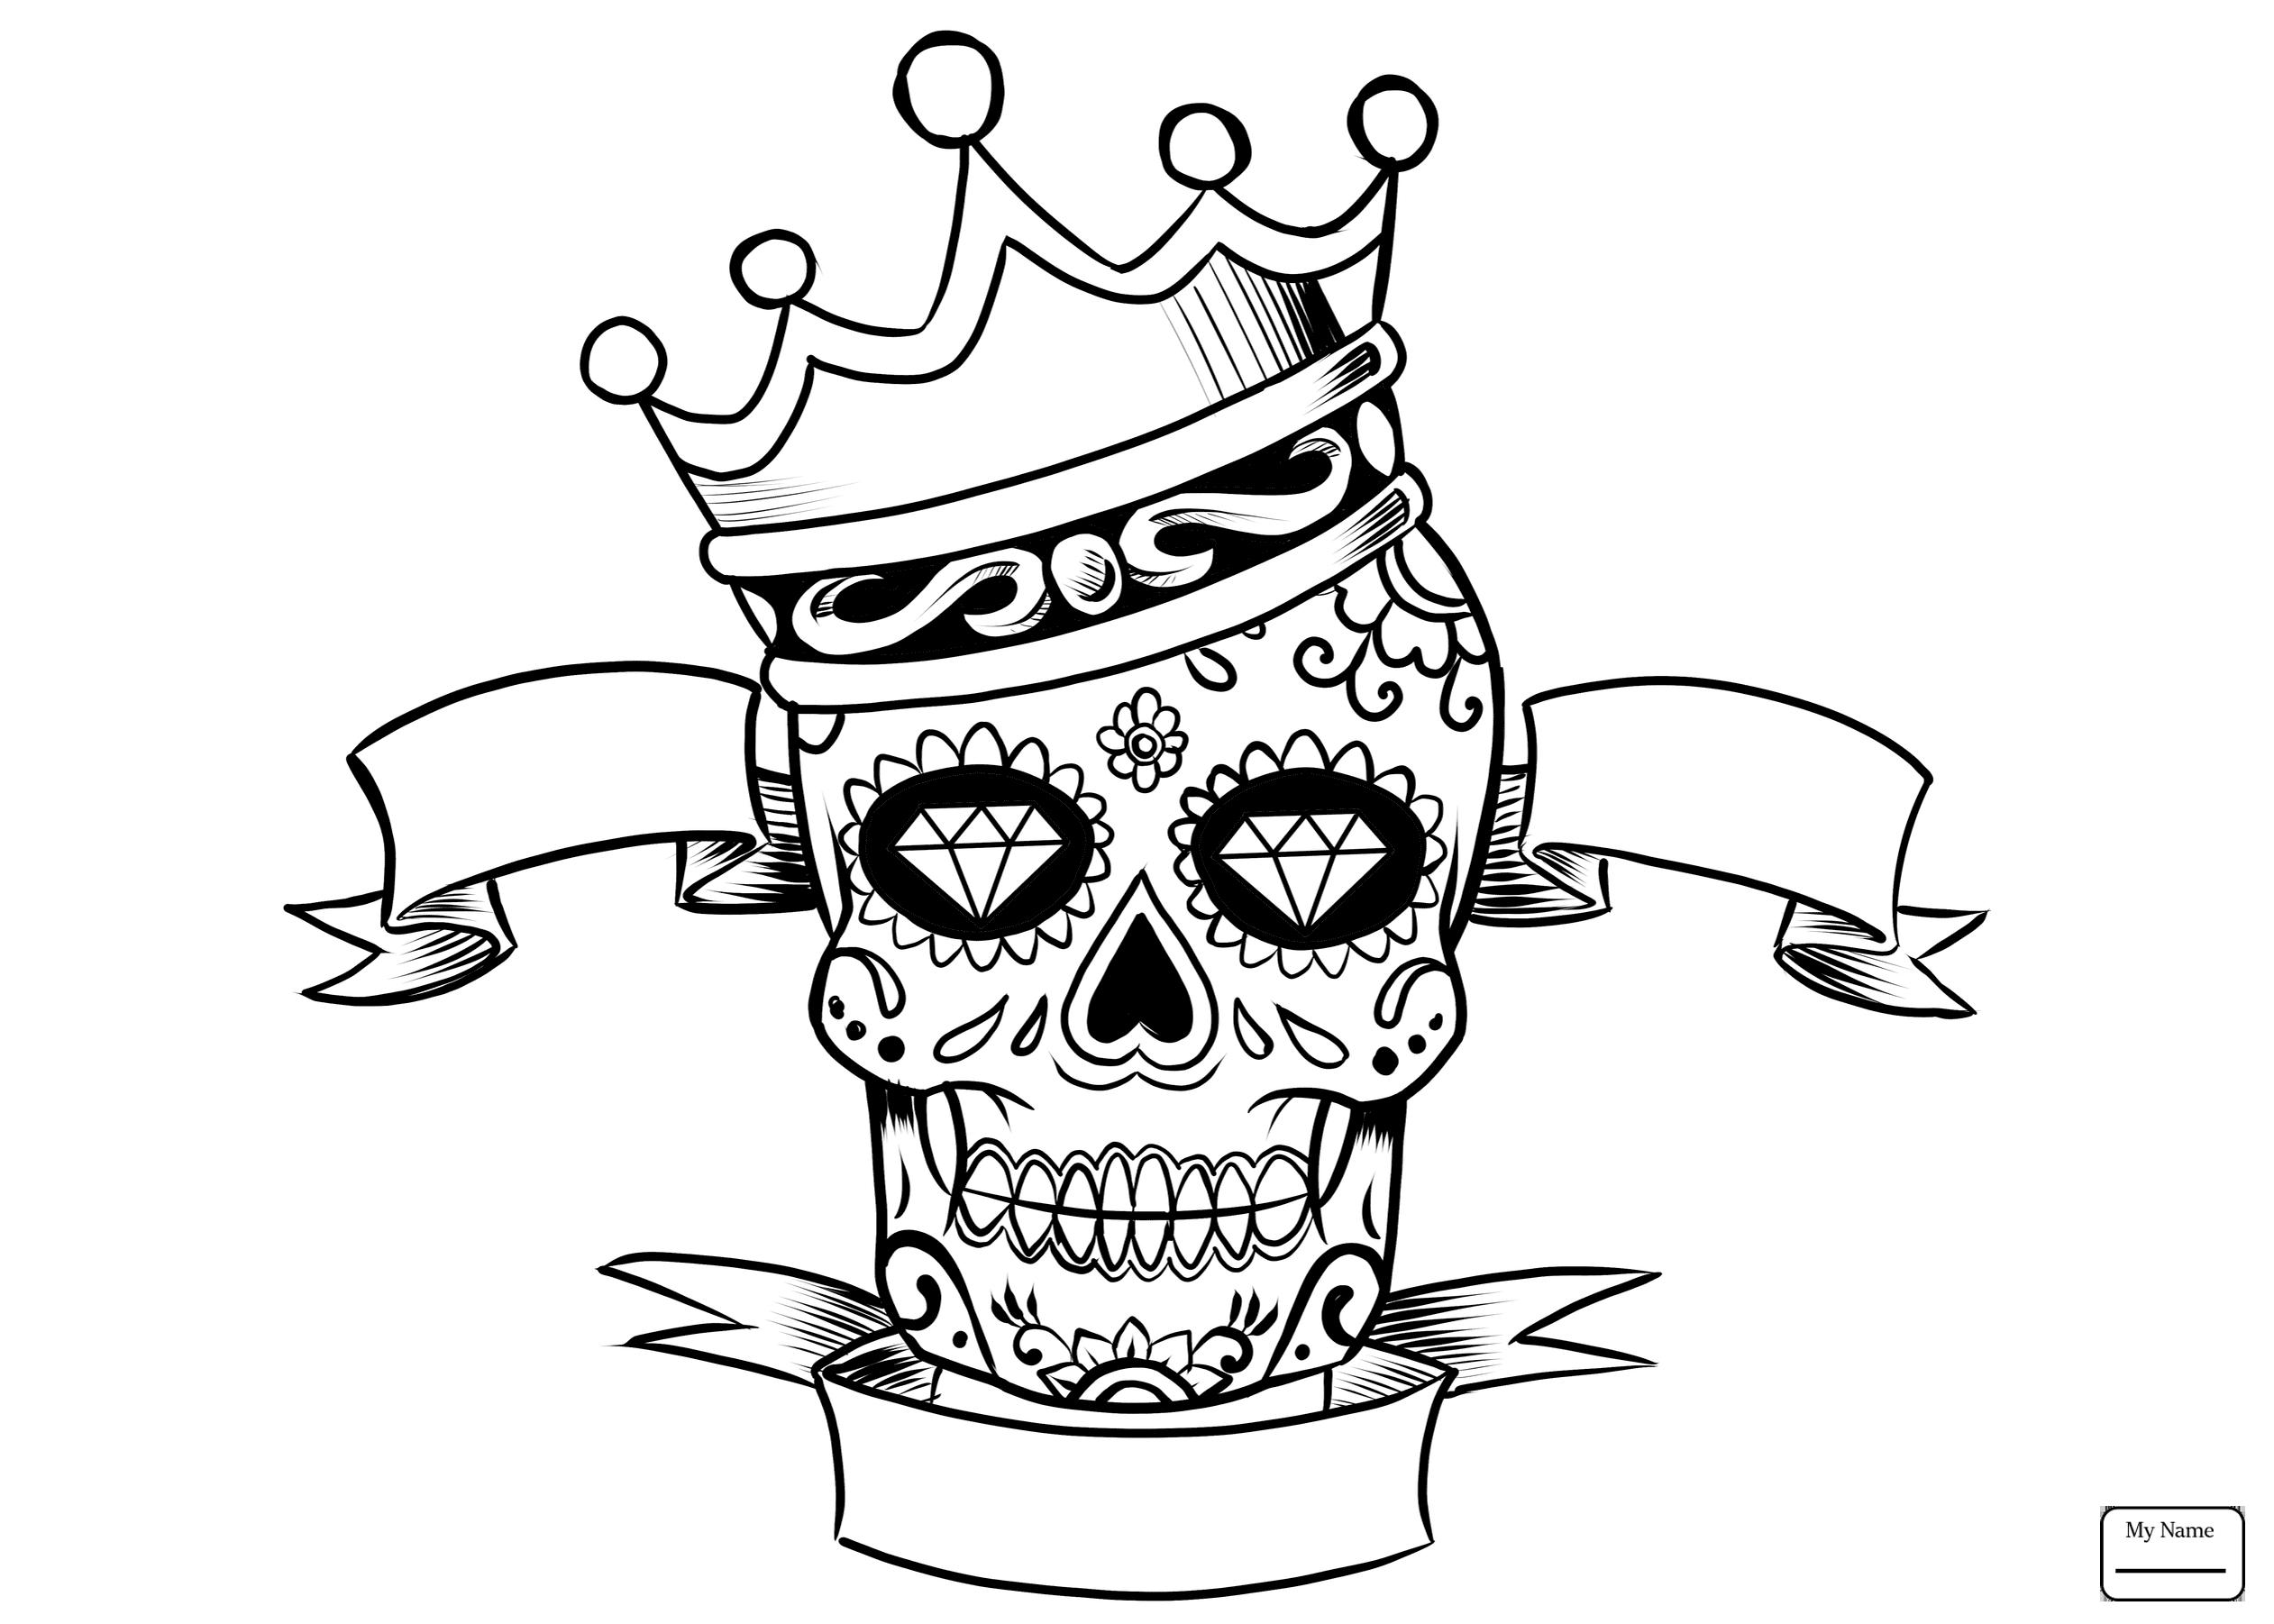 Simple Sugar Skull Drawing at GetDrawings